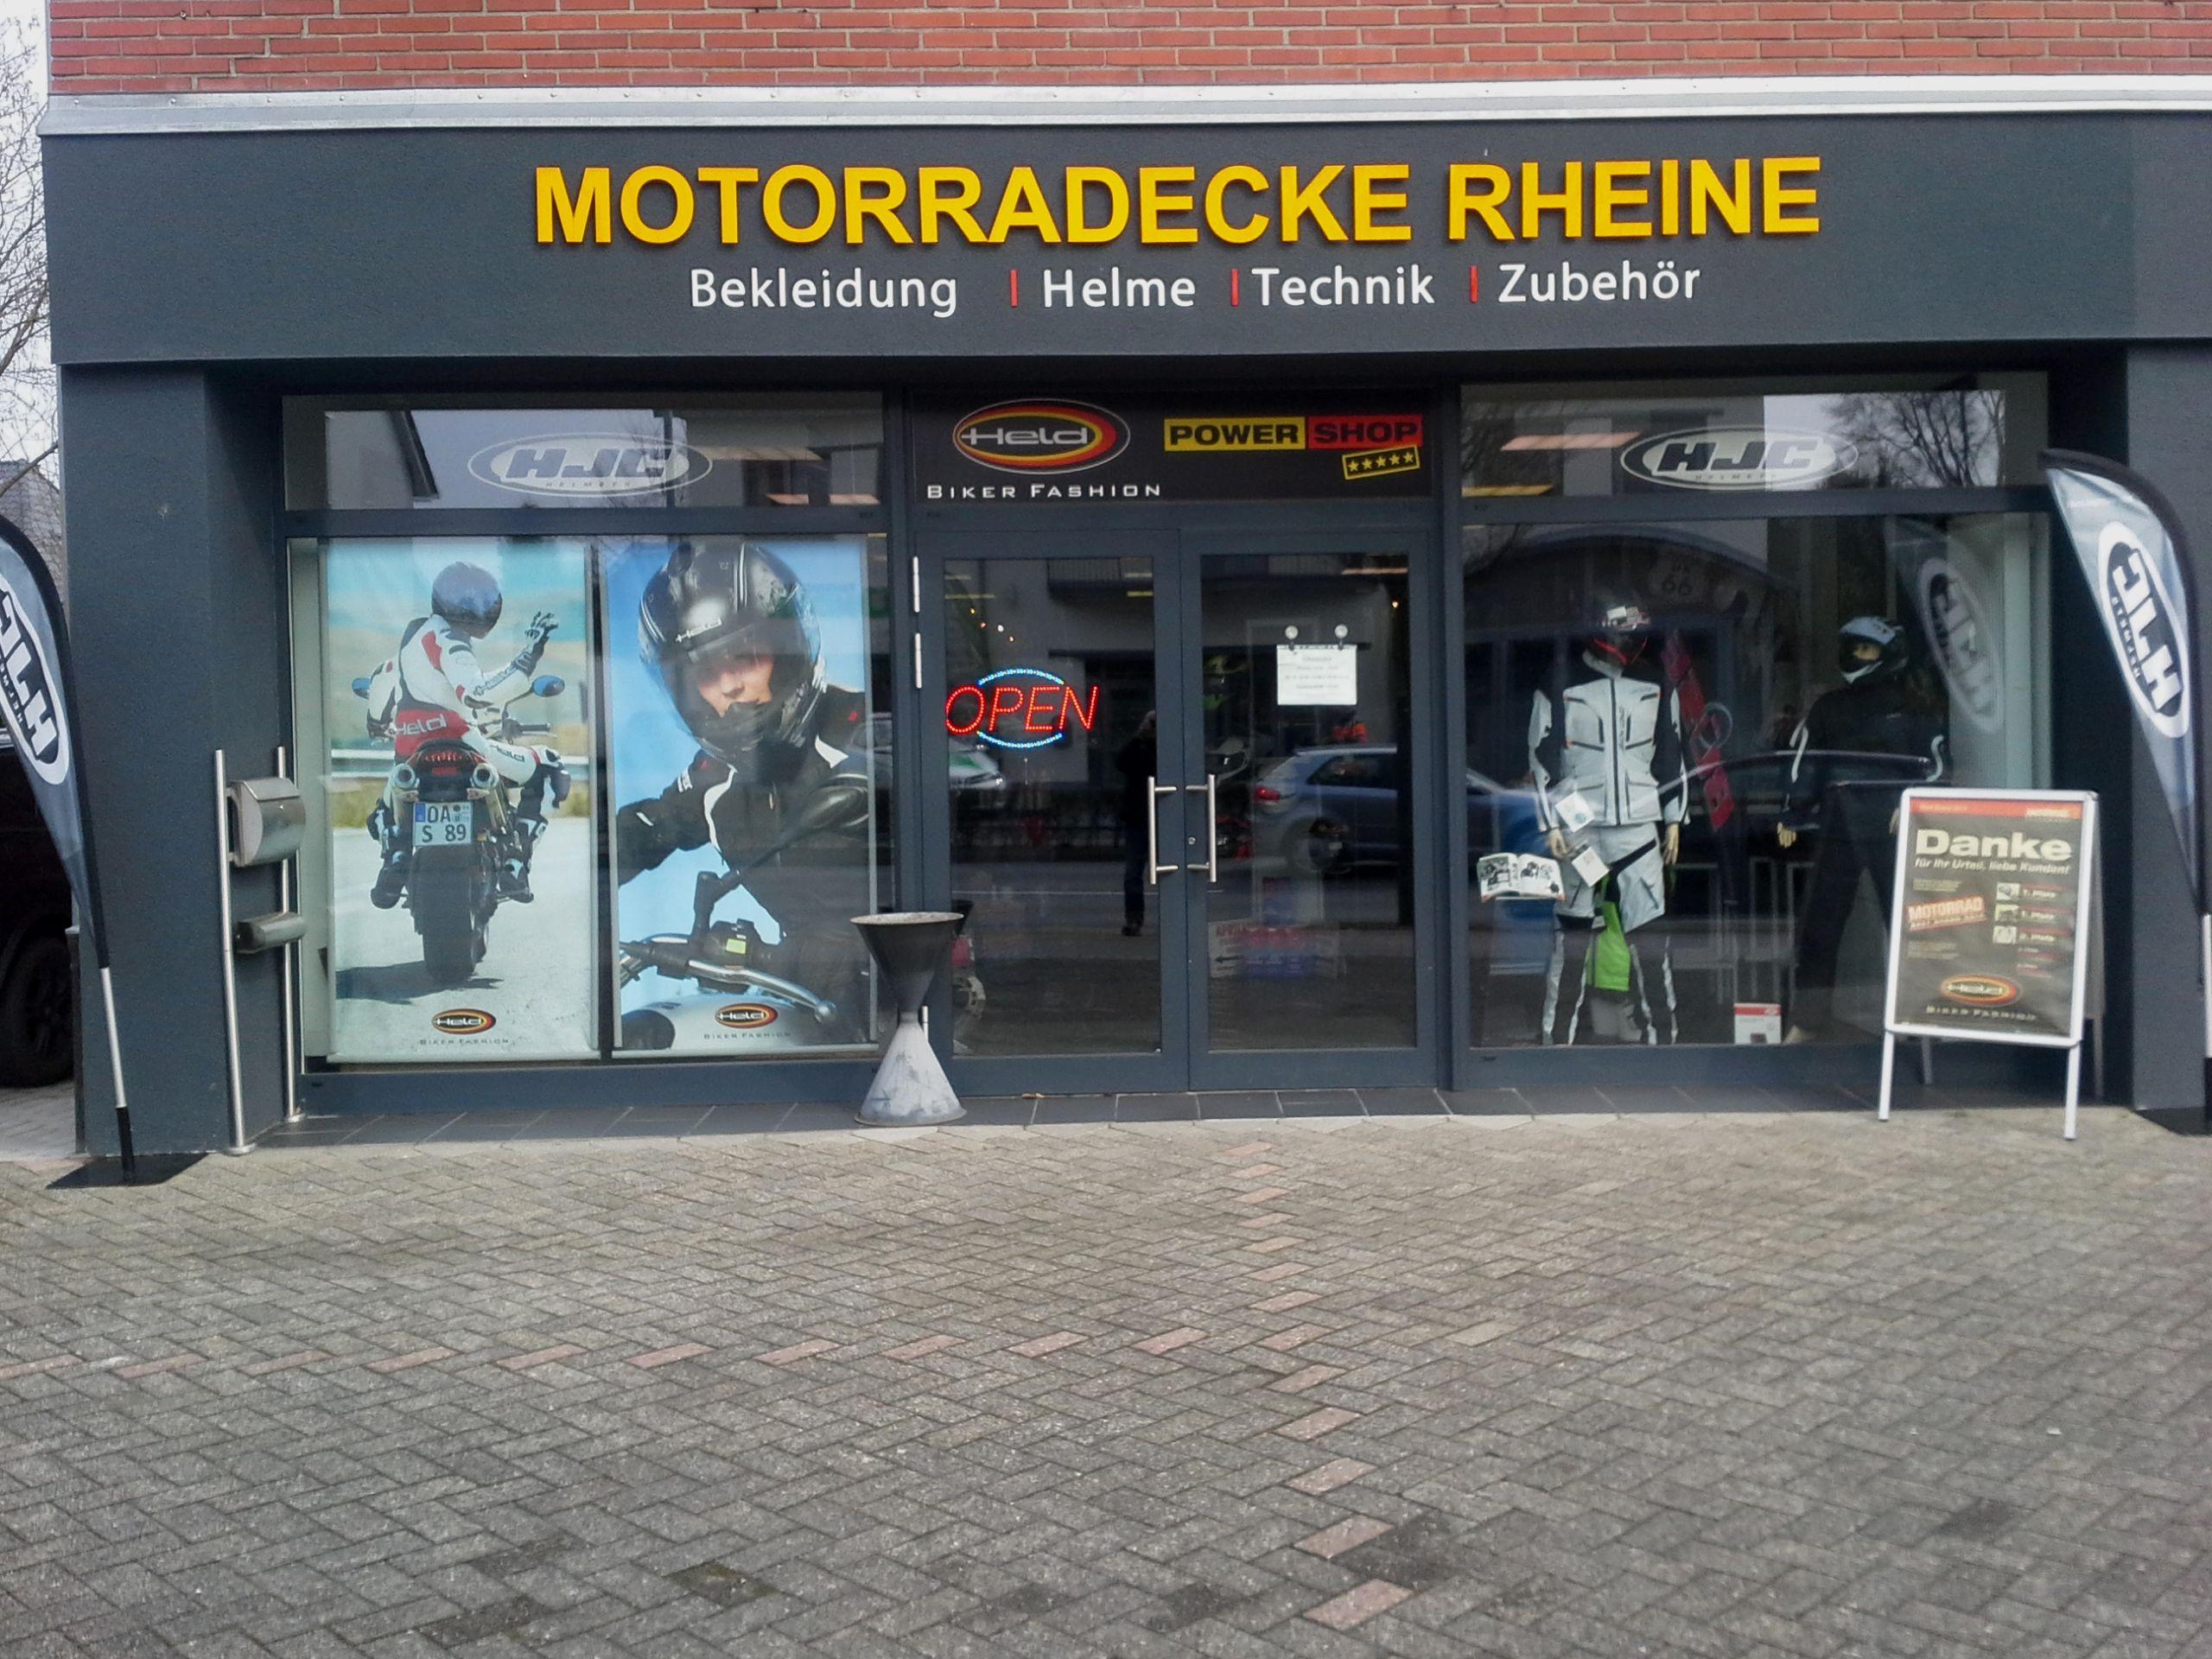 Motorrad Ecke Rheine